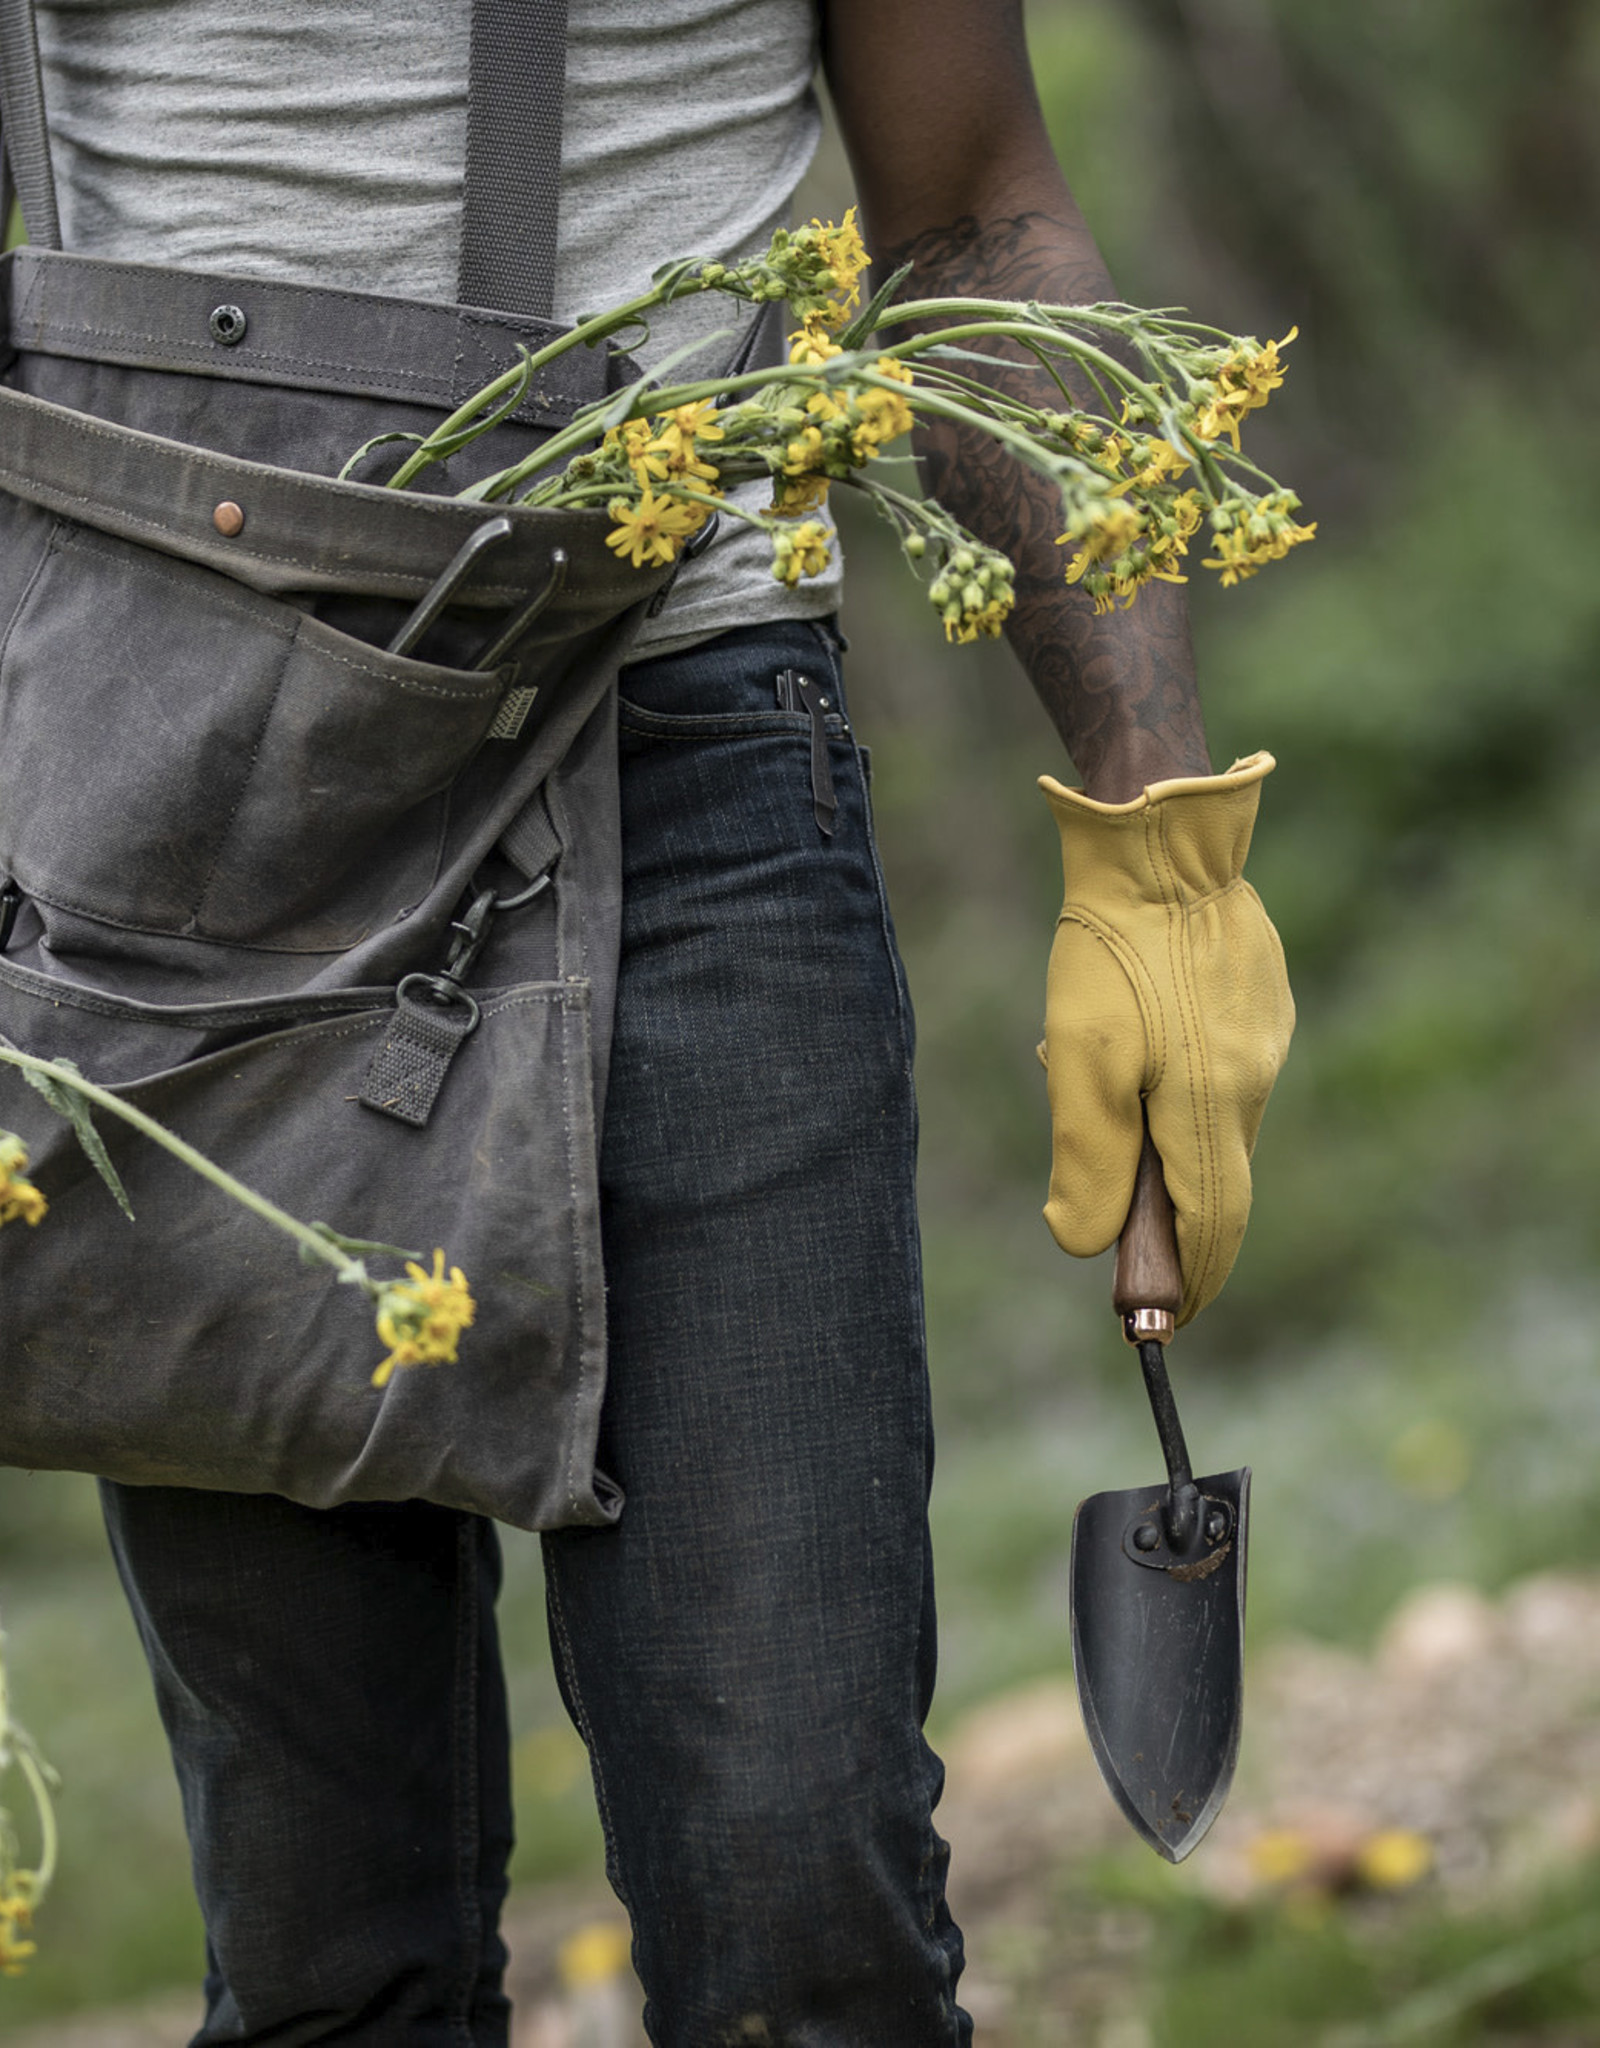 Barebones Barebones - Garden Tools - Walnut Handle Spade